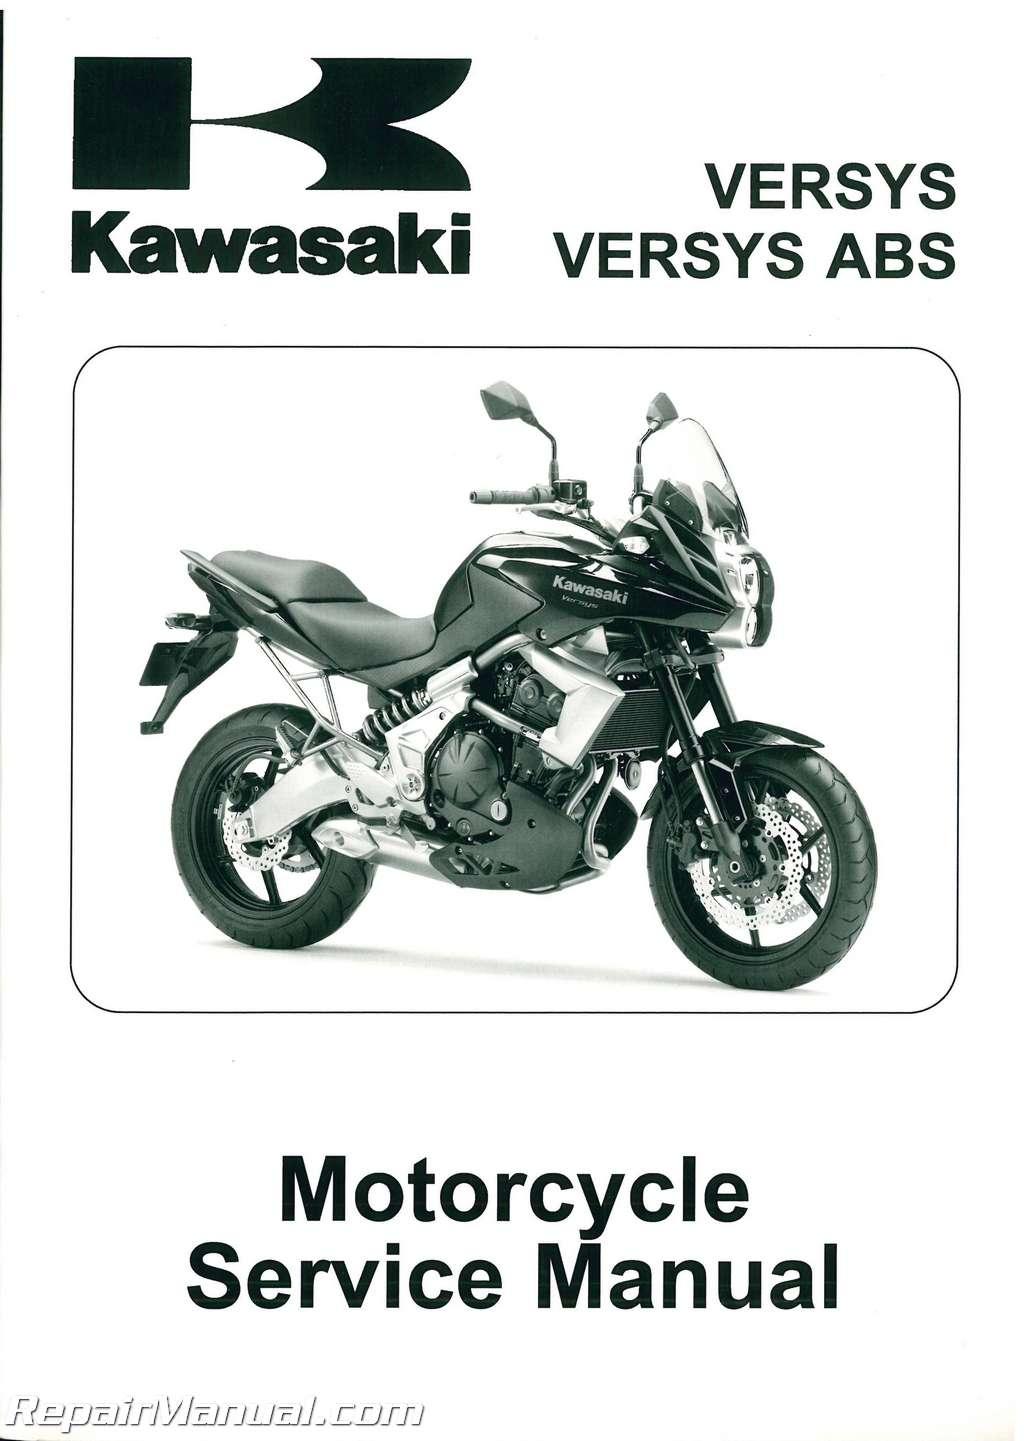 f8c178b4350 2010-2011 Kawasaki KLE650 Versys Service Manual